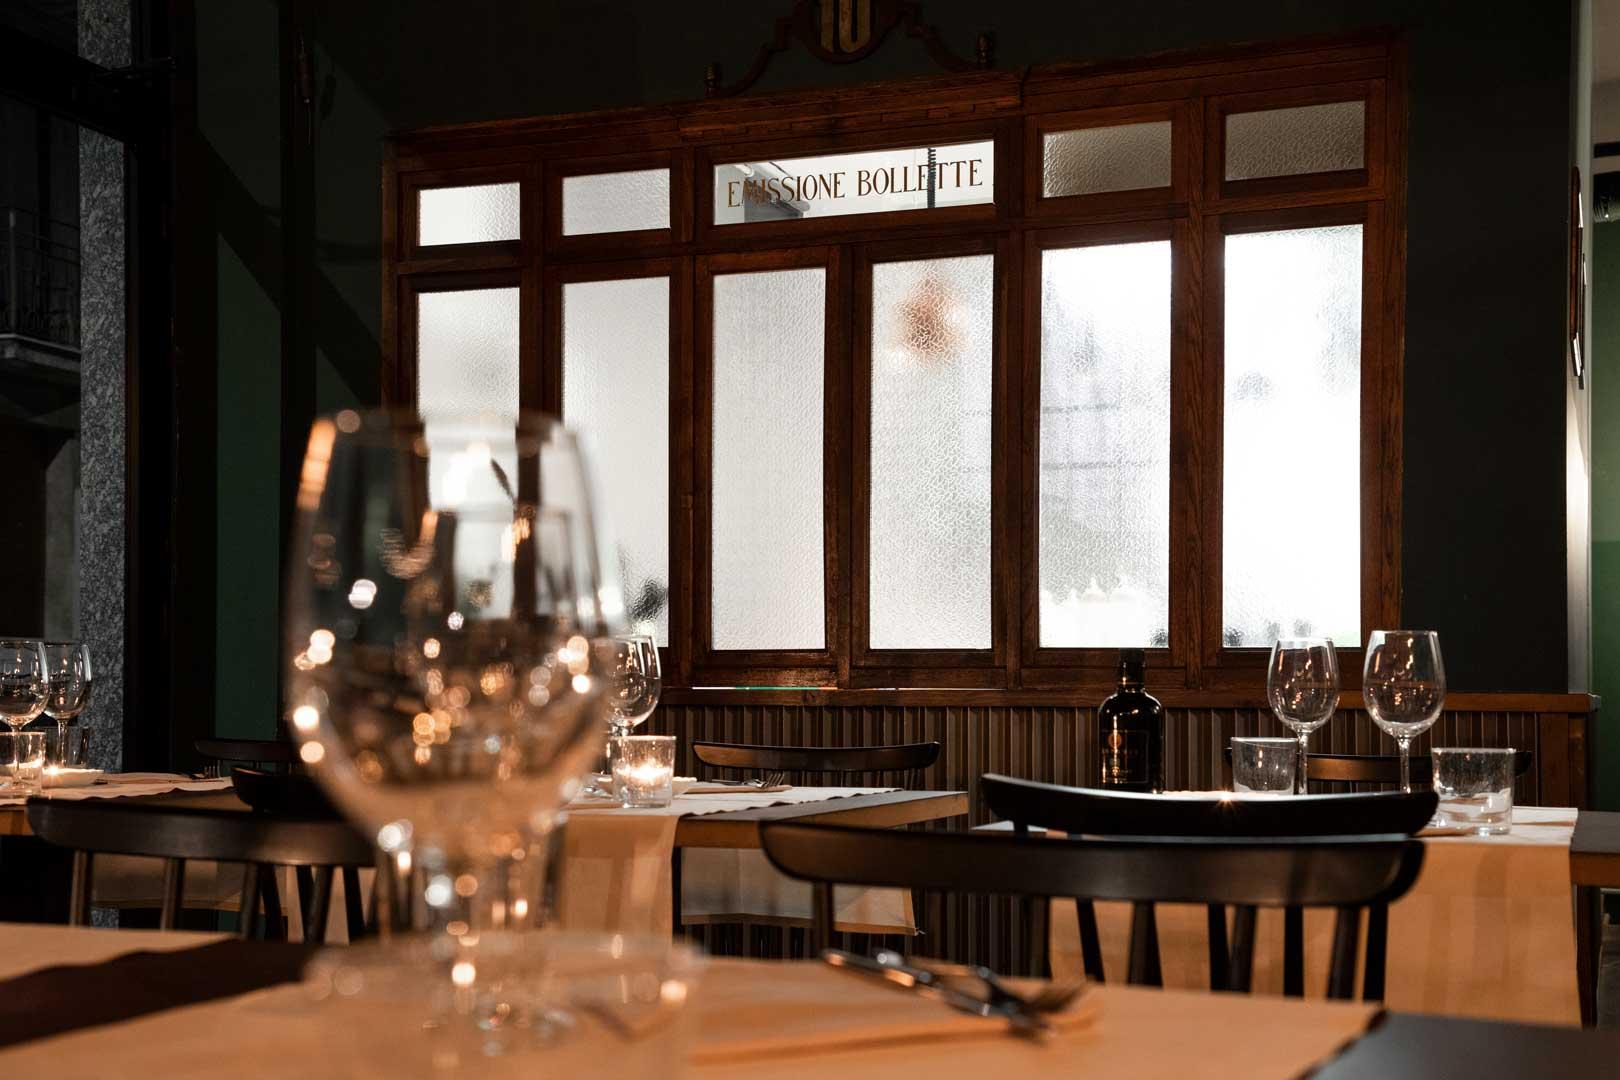 il-menu-invernale-di-posta-bistrot-dettagli